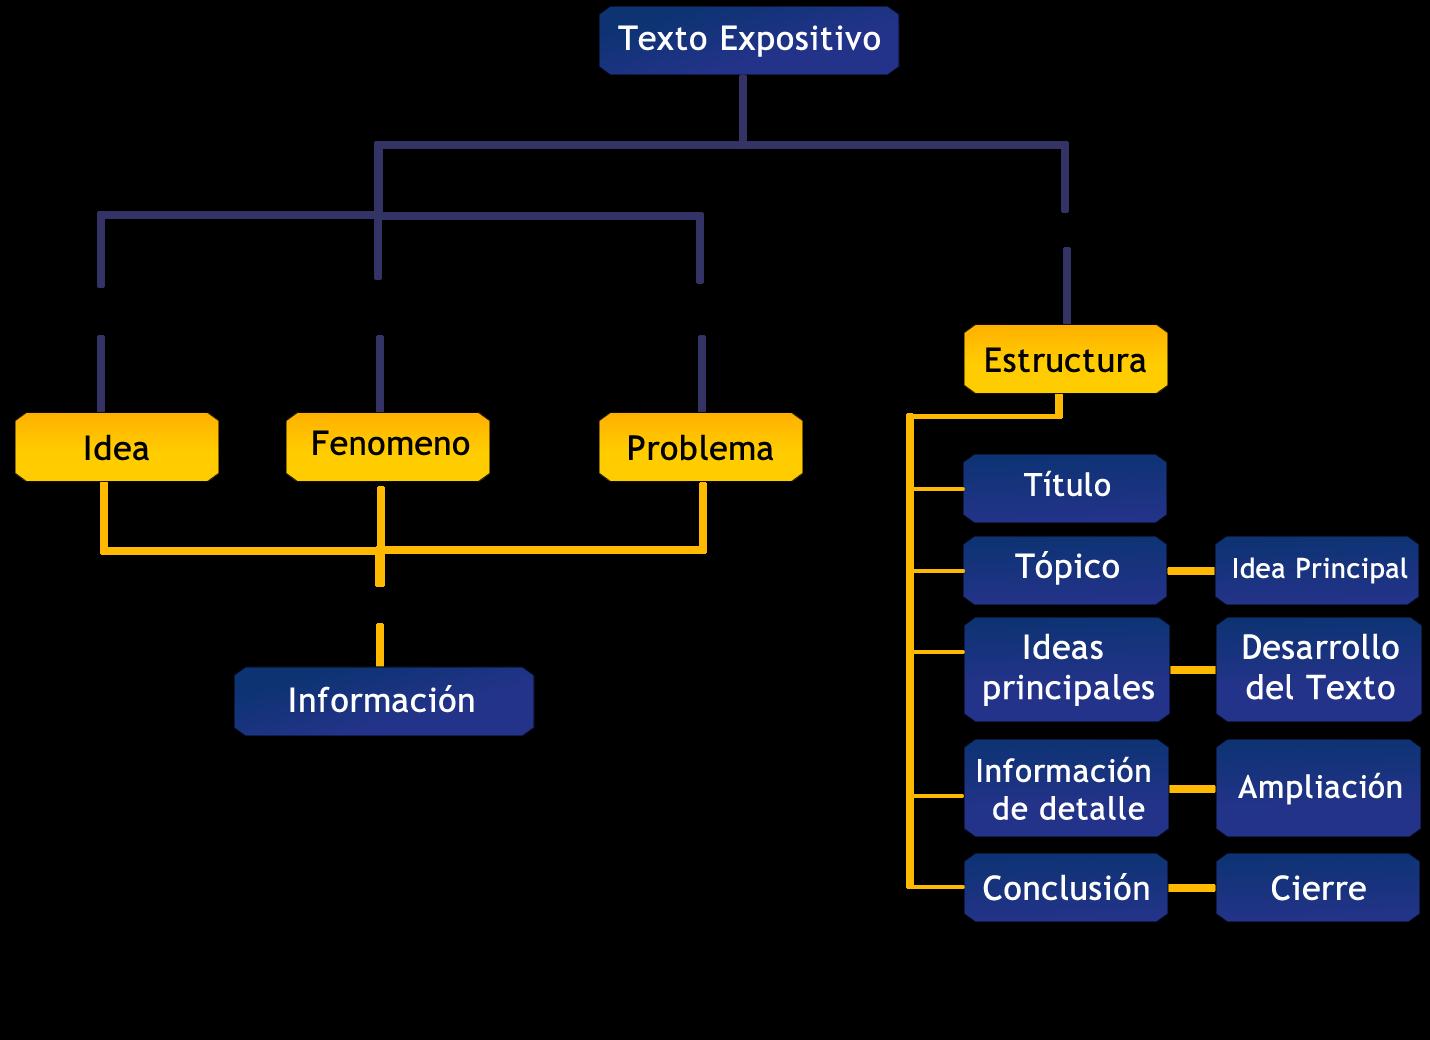 Lengua Catellana Qué Es El Texto Expositivo